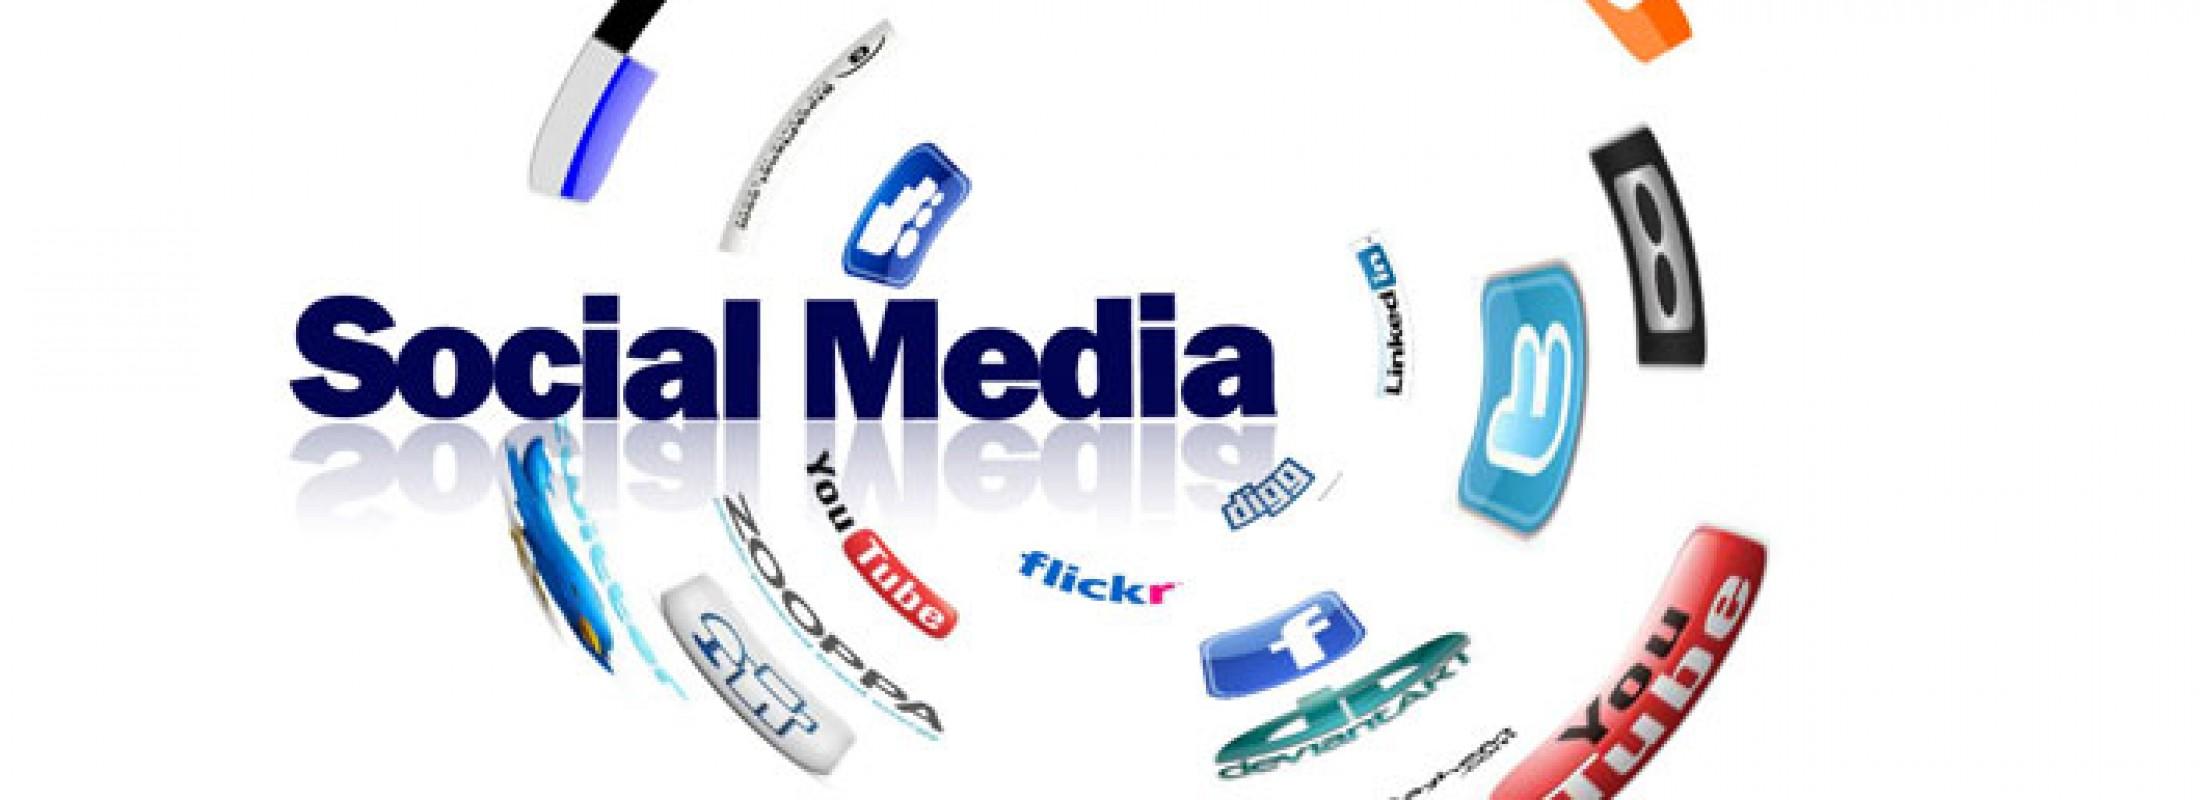 estrategia social media 2